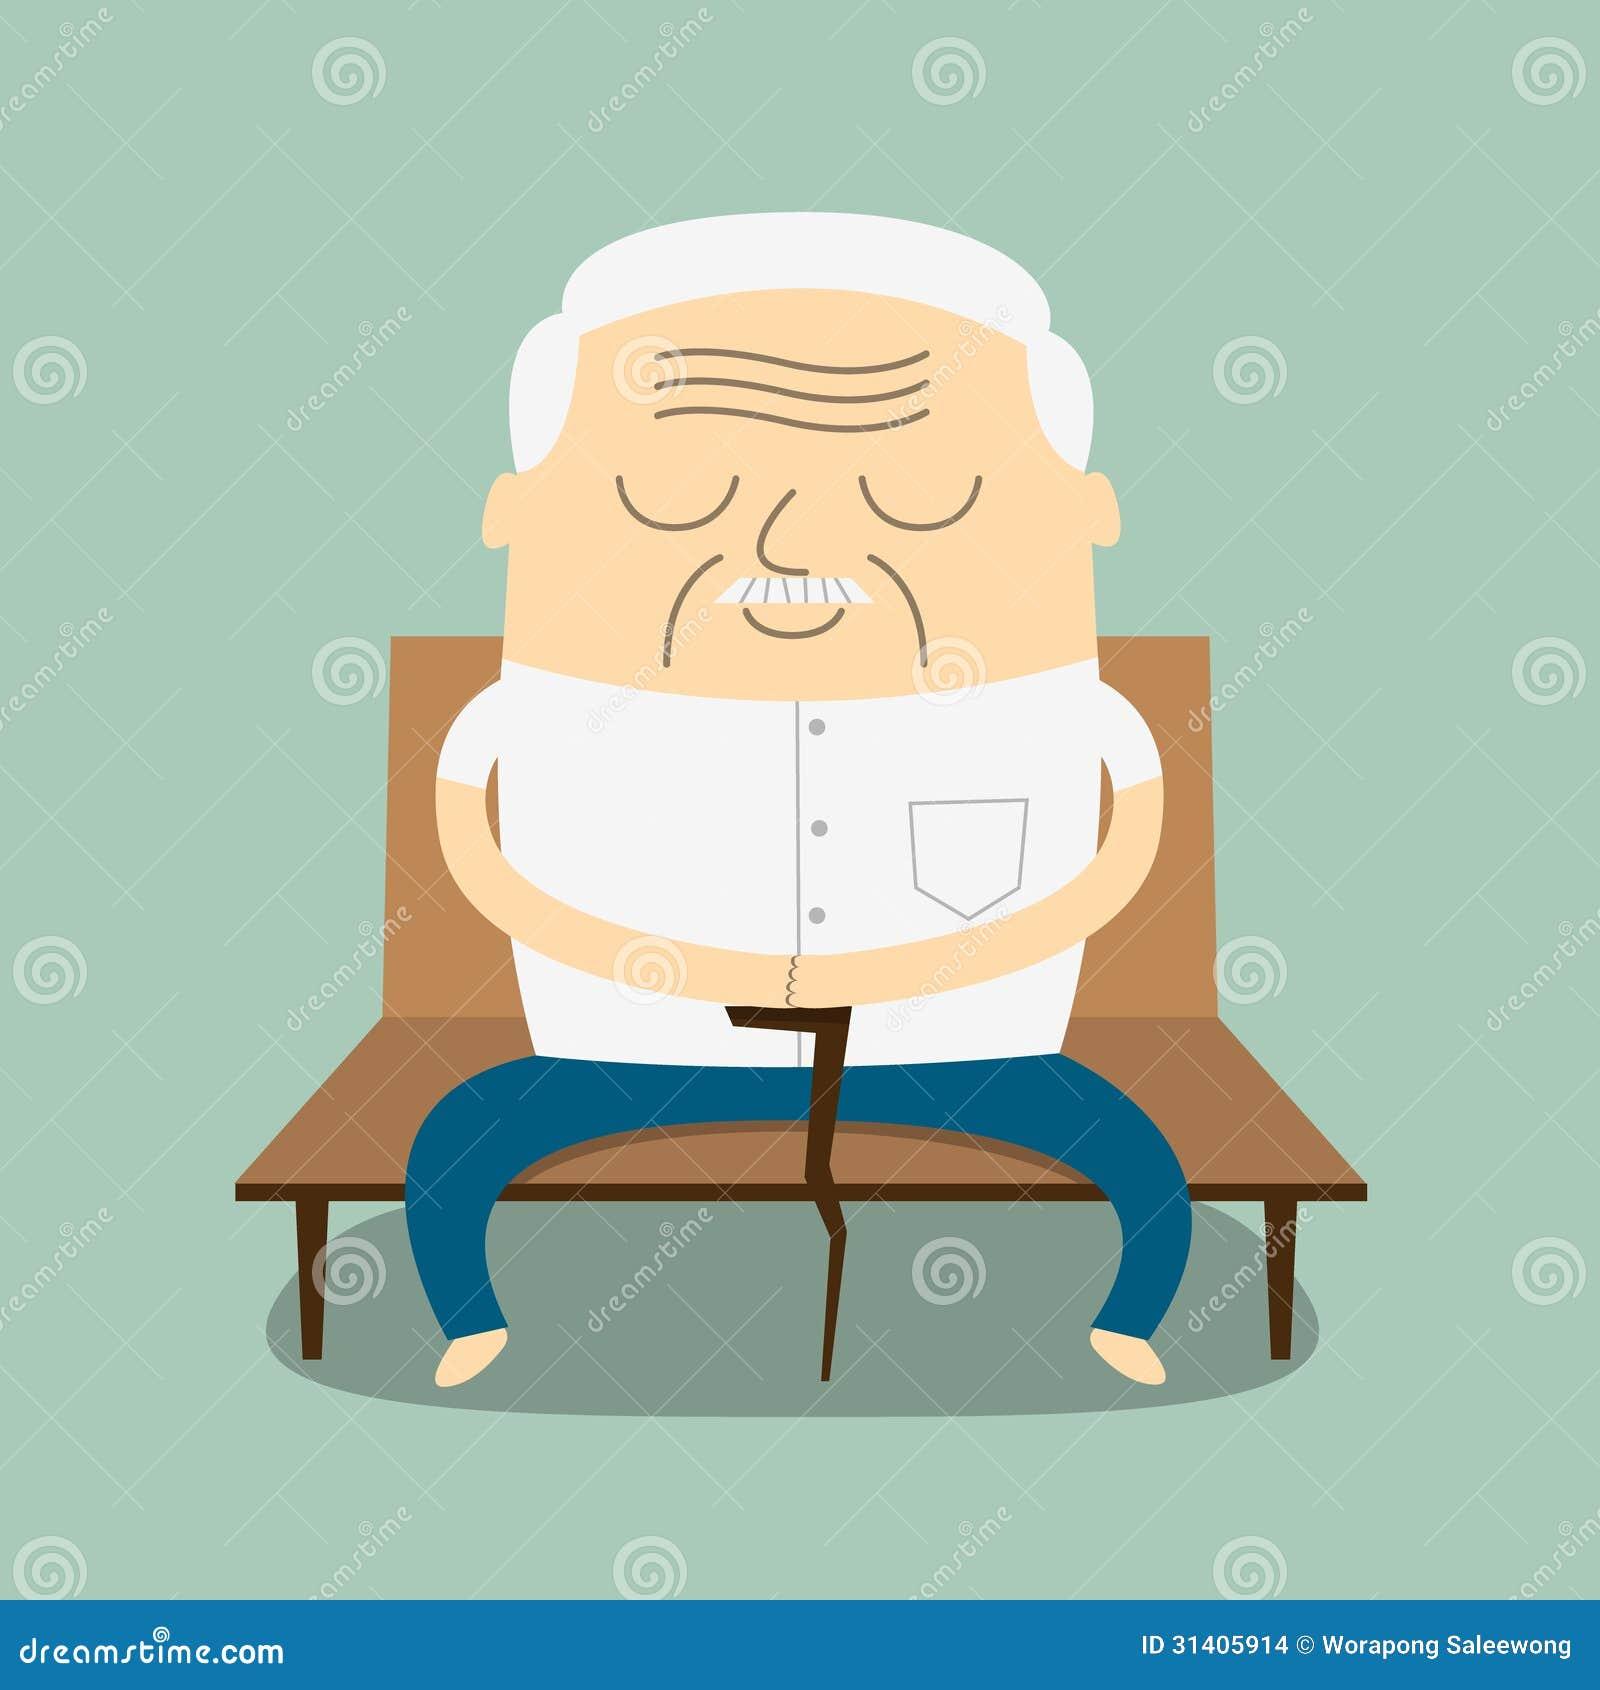 Cartoon Old Man Sitting On Bench Stock Vector ...